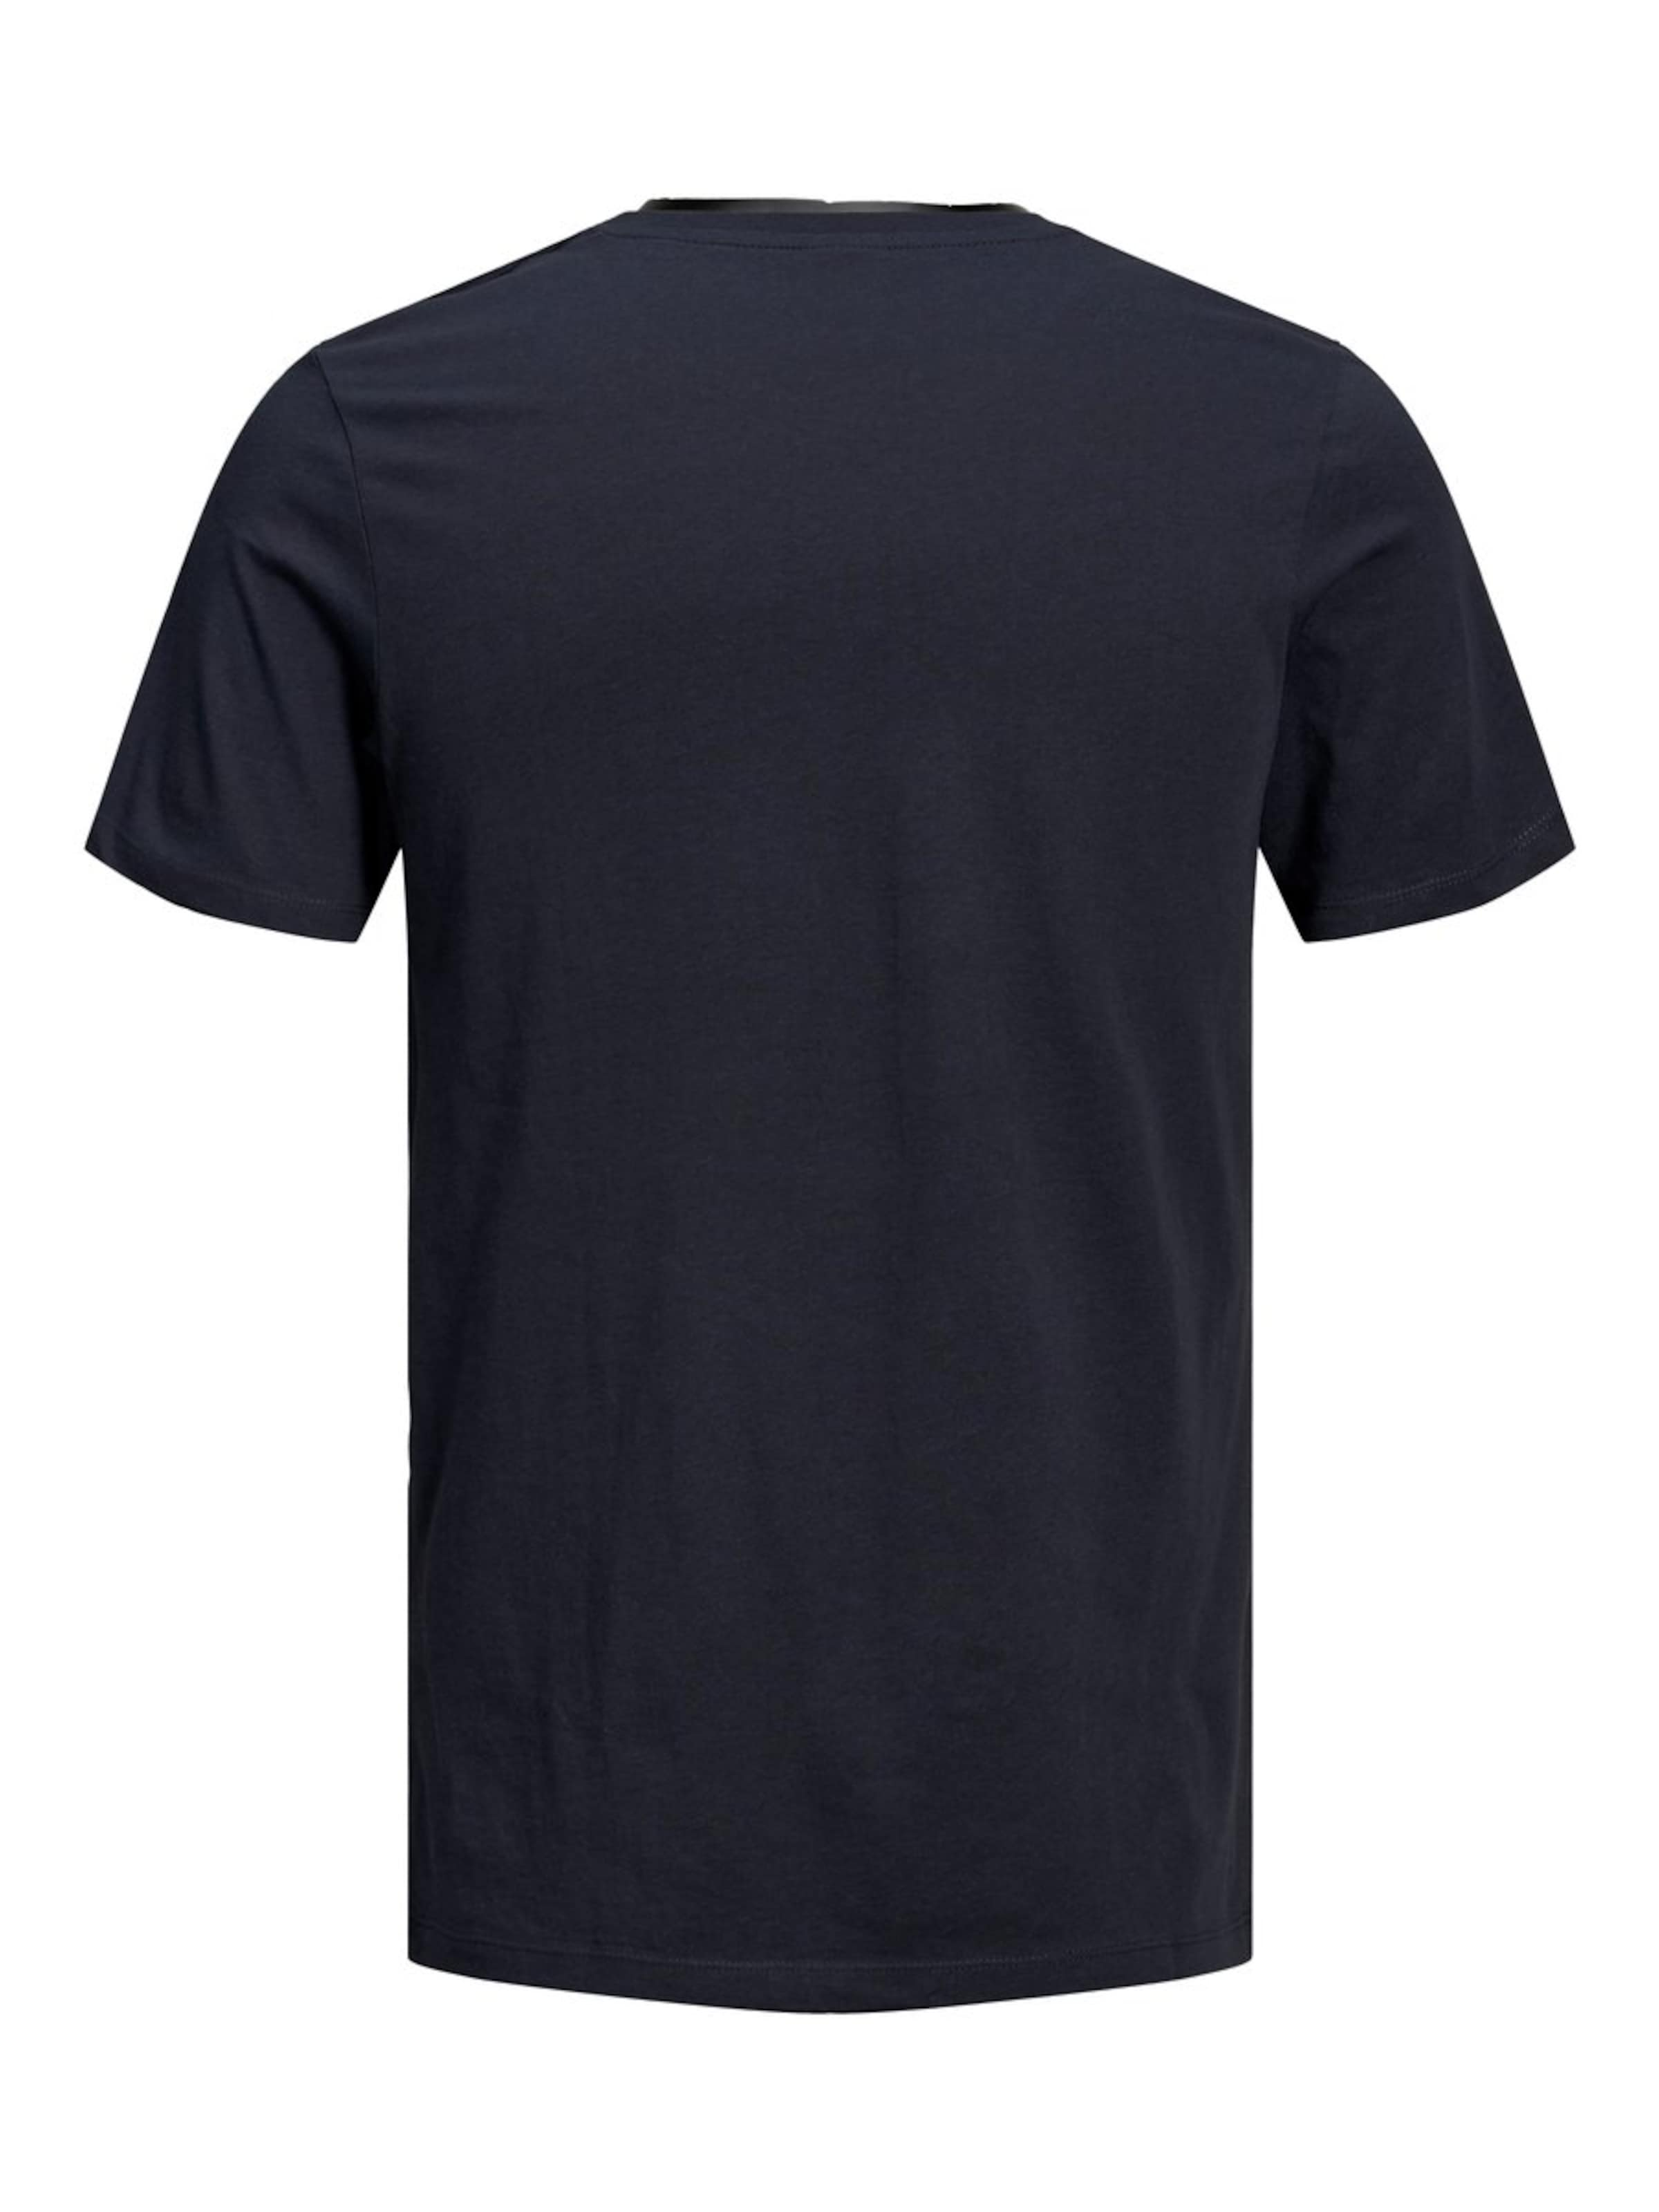 Jackamp; shirt CyanFoncé T Bleu En Jones HEID29